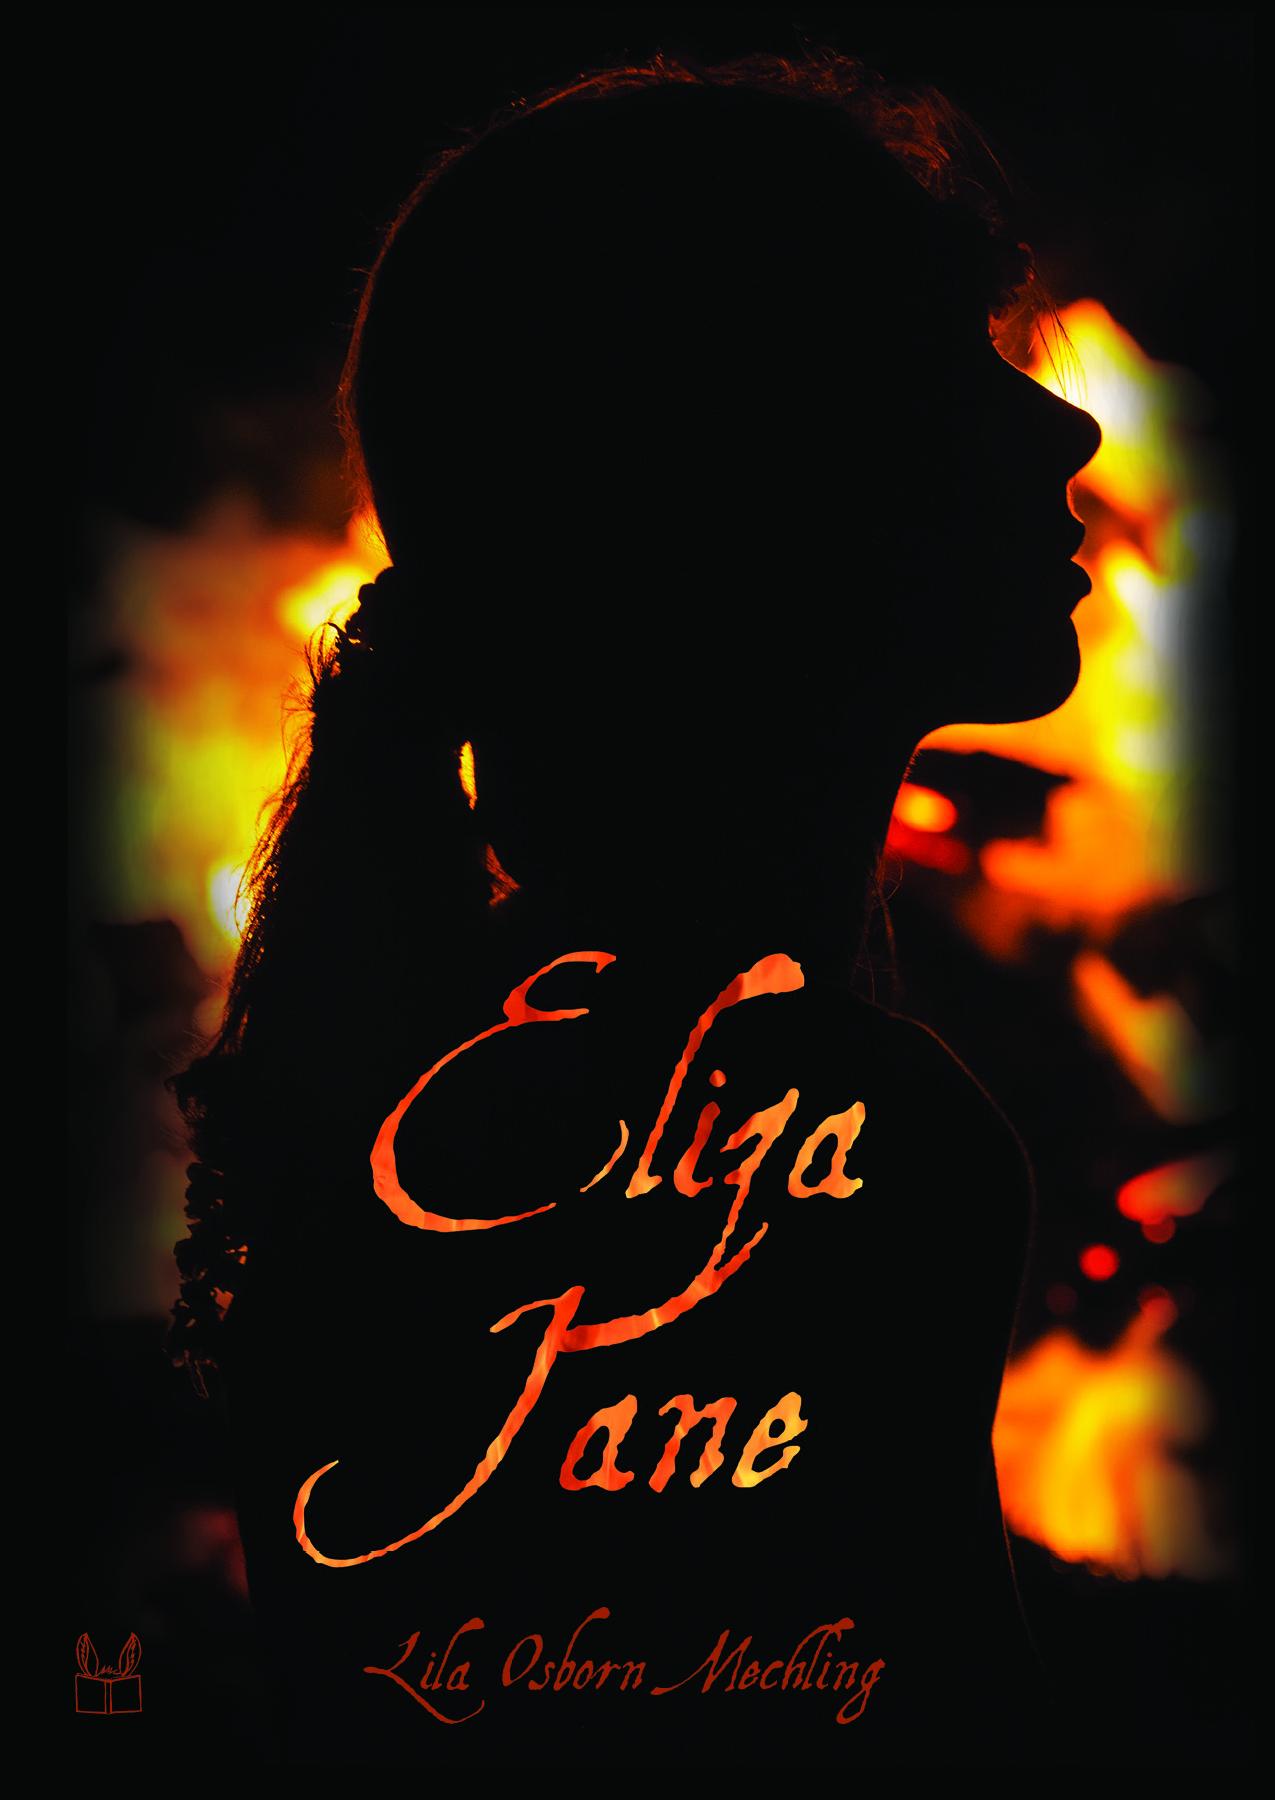 Postcard for Eliza Jane by Lila Osborn Mechling (Donkey Ears Publishing, December 2018)